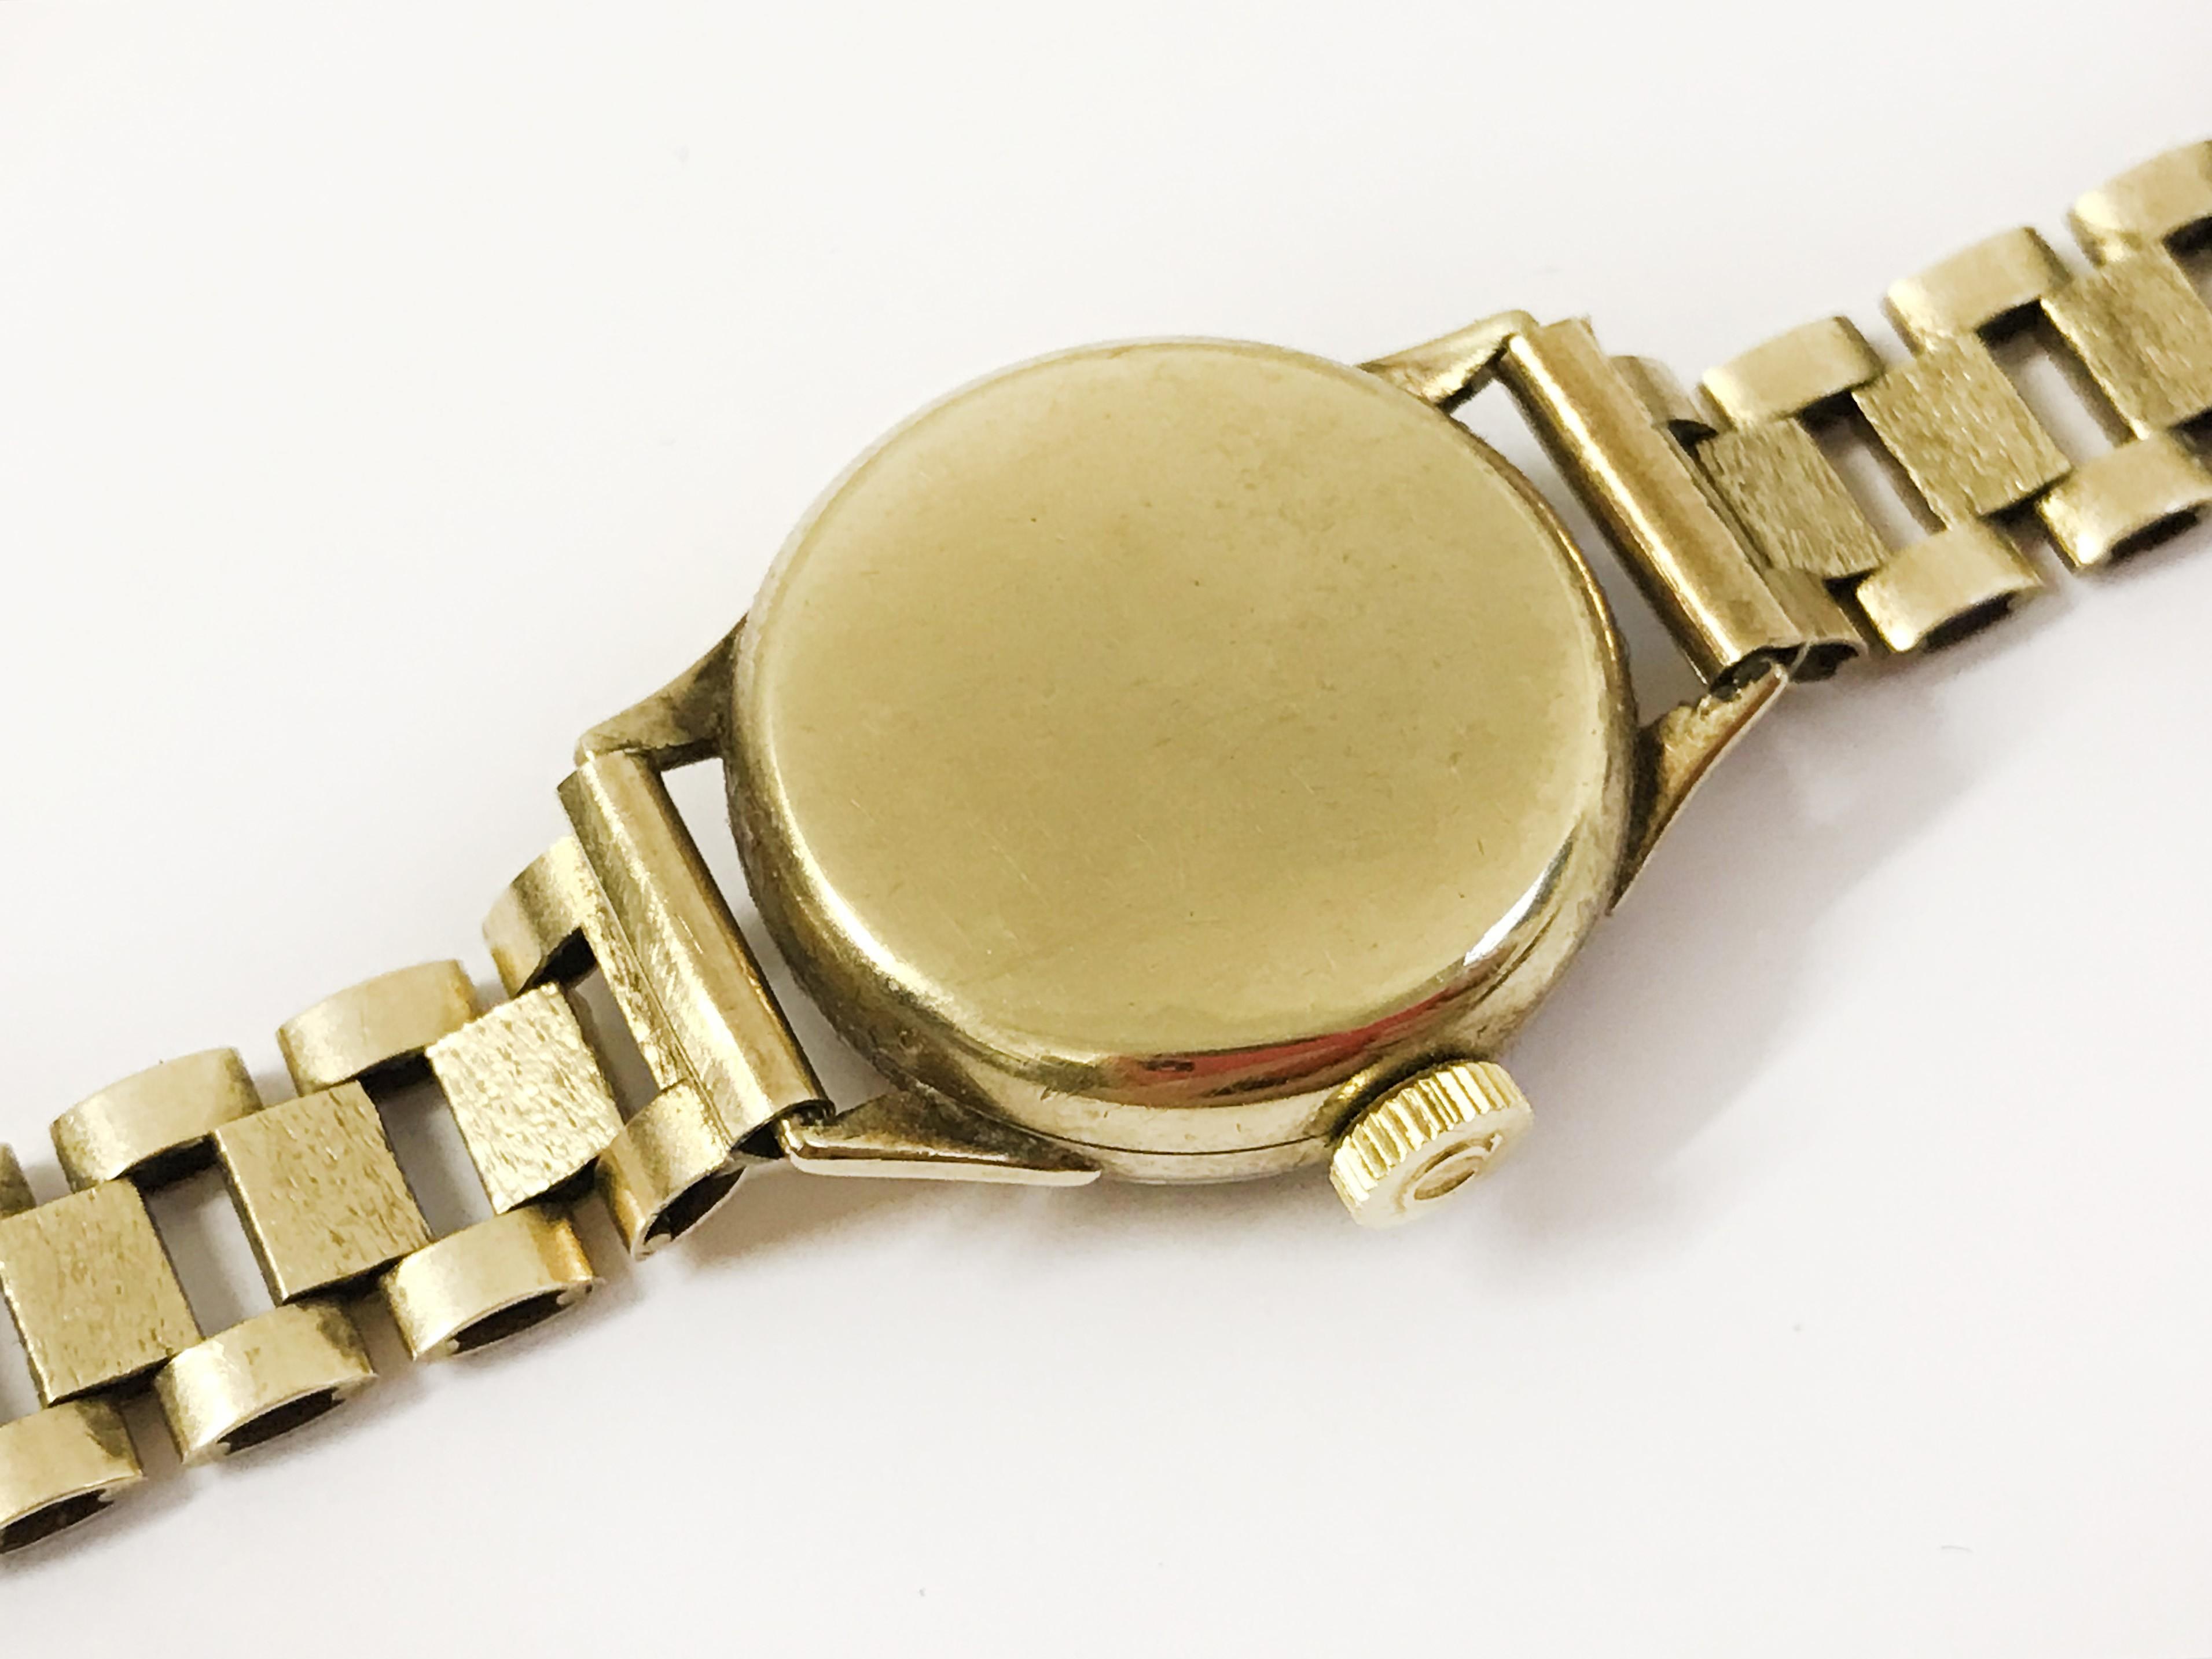 Lot 10A - 9ct GOLD WRISTWEAR WATCH BY OMEGA